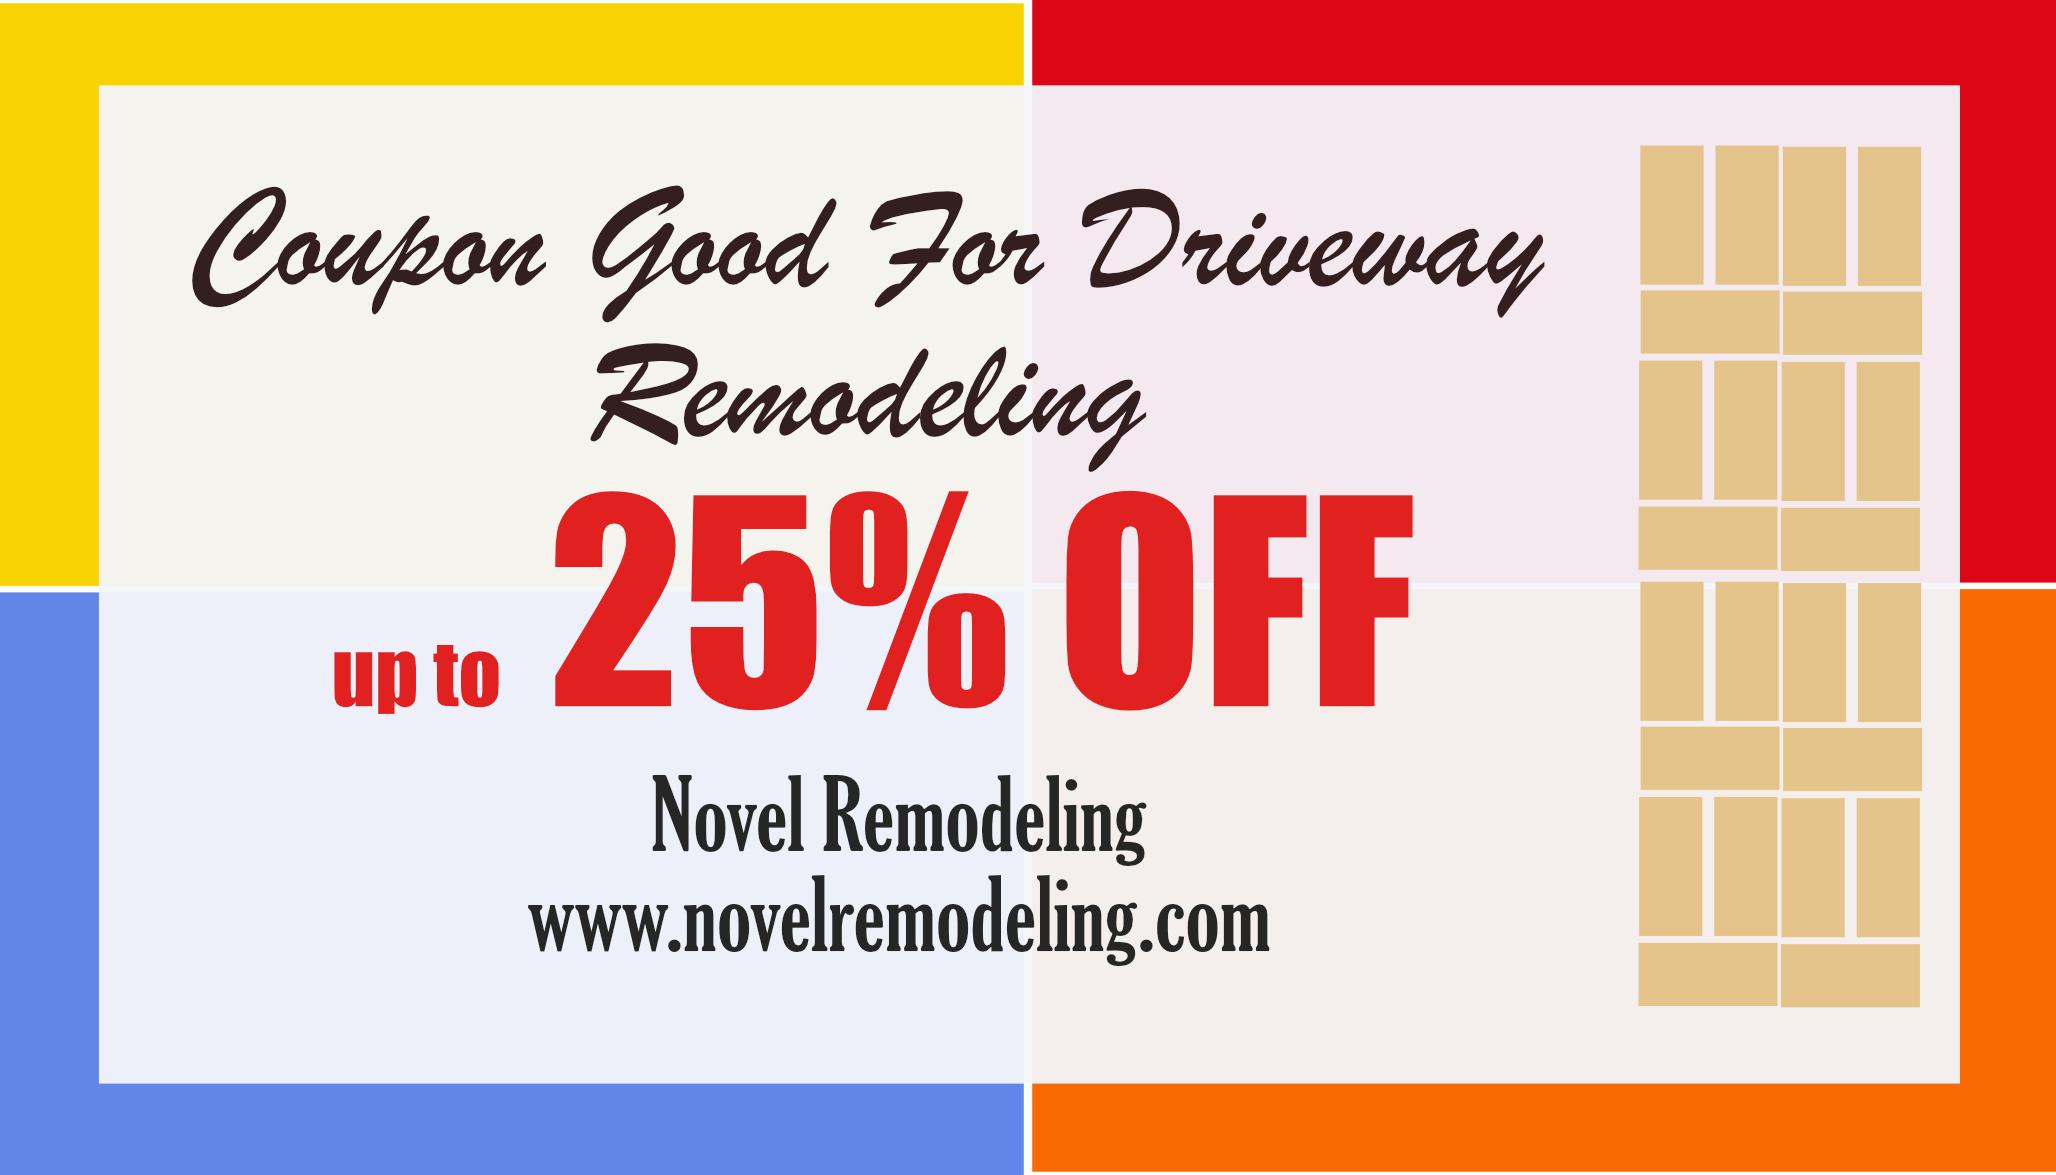 novel remodeling 25% Off Coupon Driveway Remodeling Los Angeles